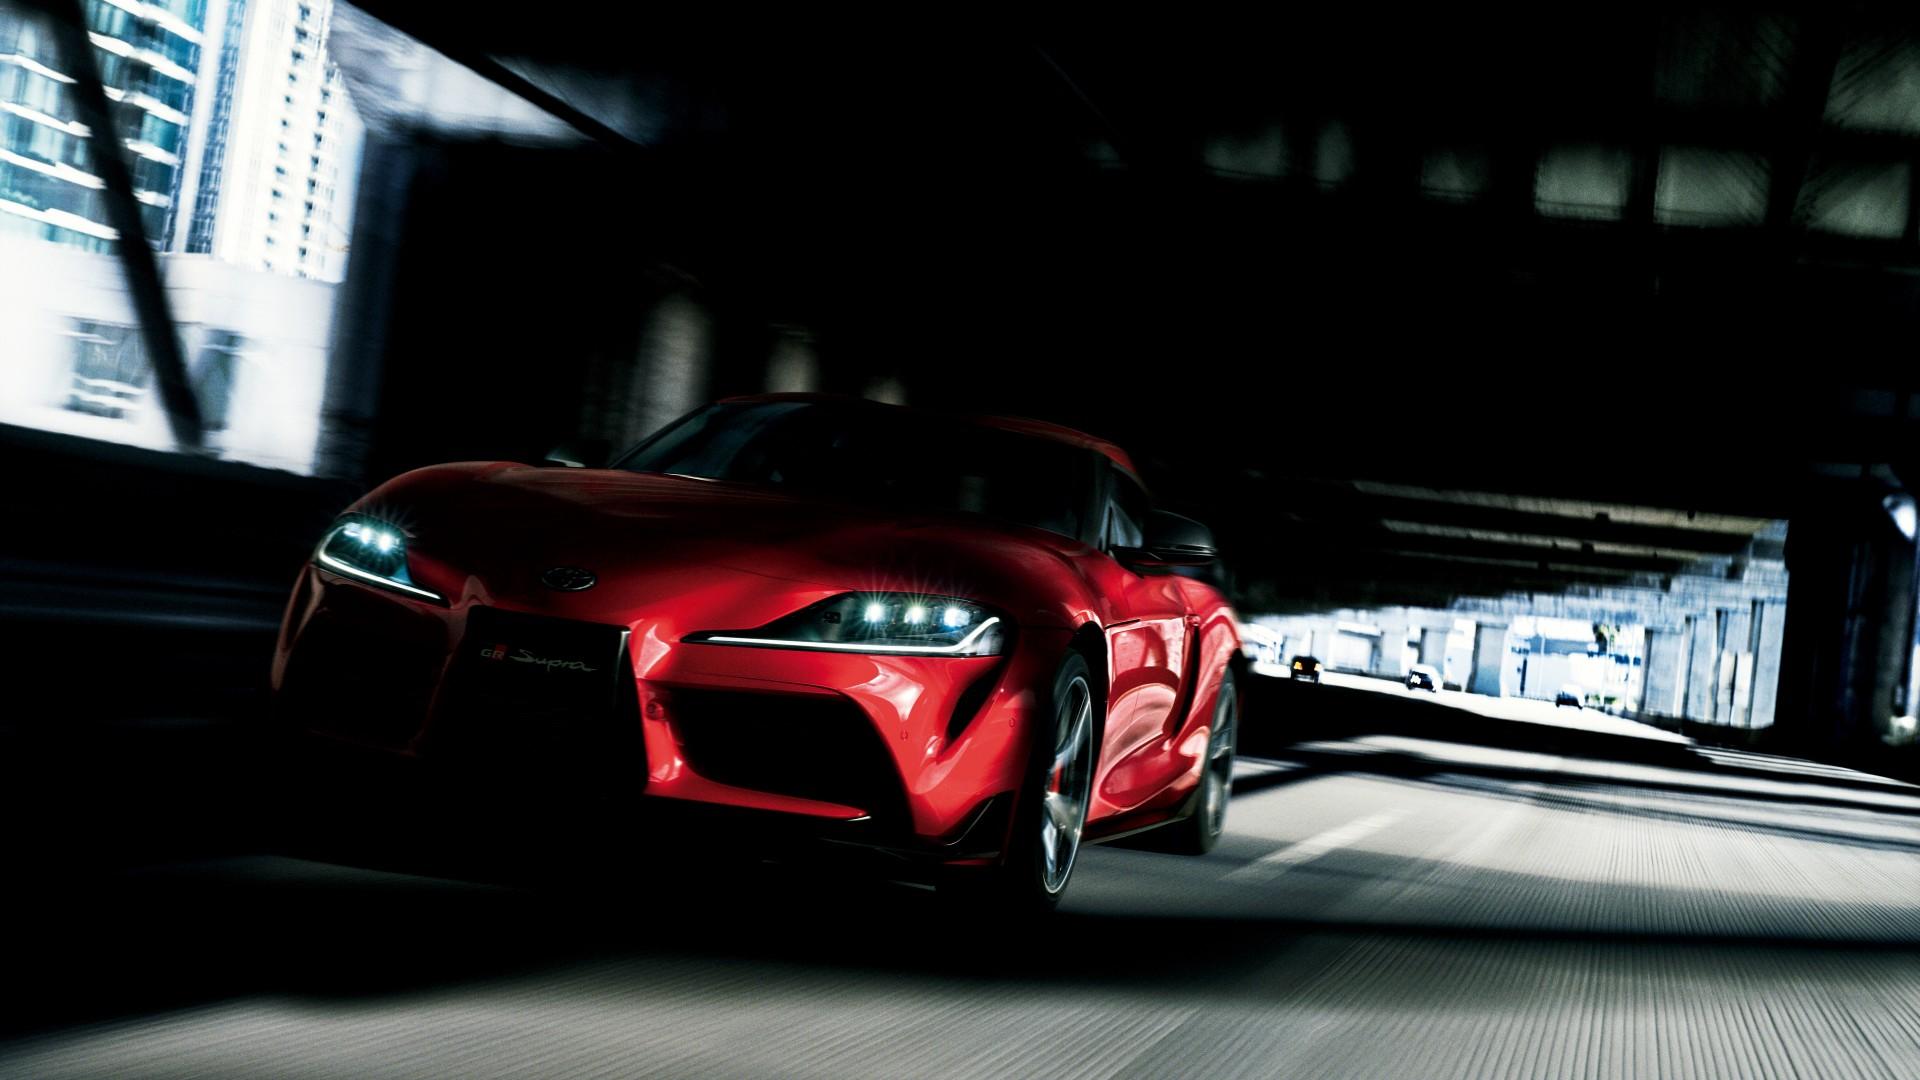 Toyota Gr Supra 2019 4k 8k Wallpapers Hd Wallpapers Id